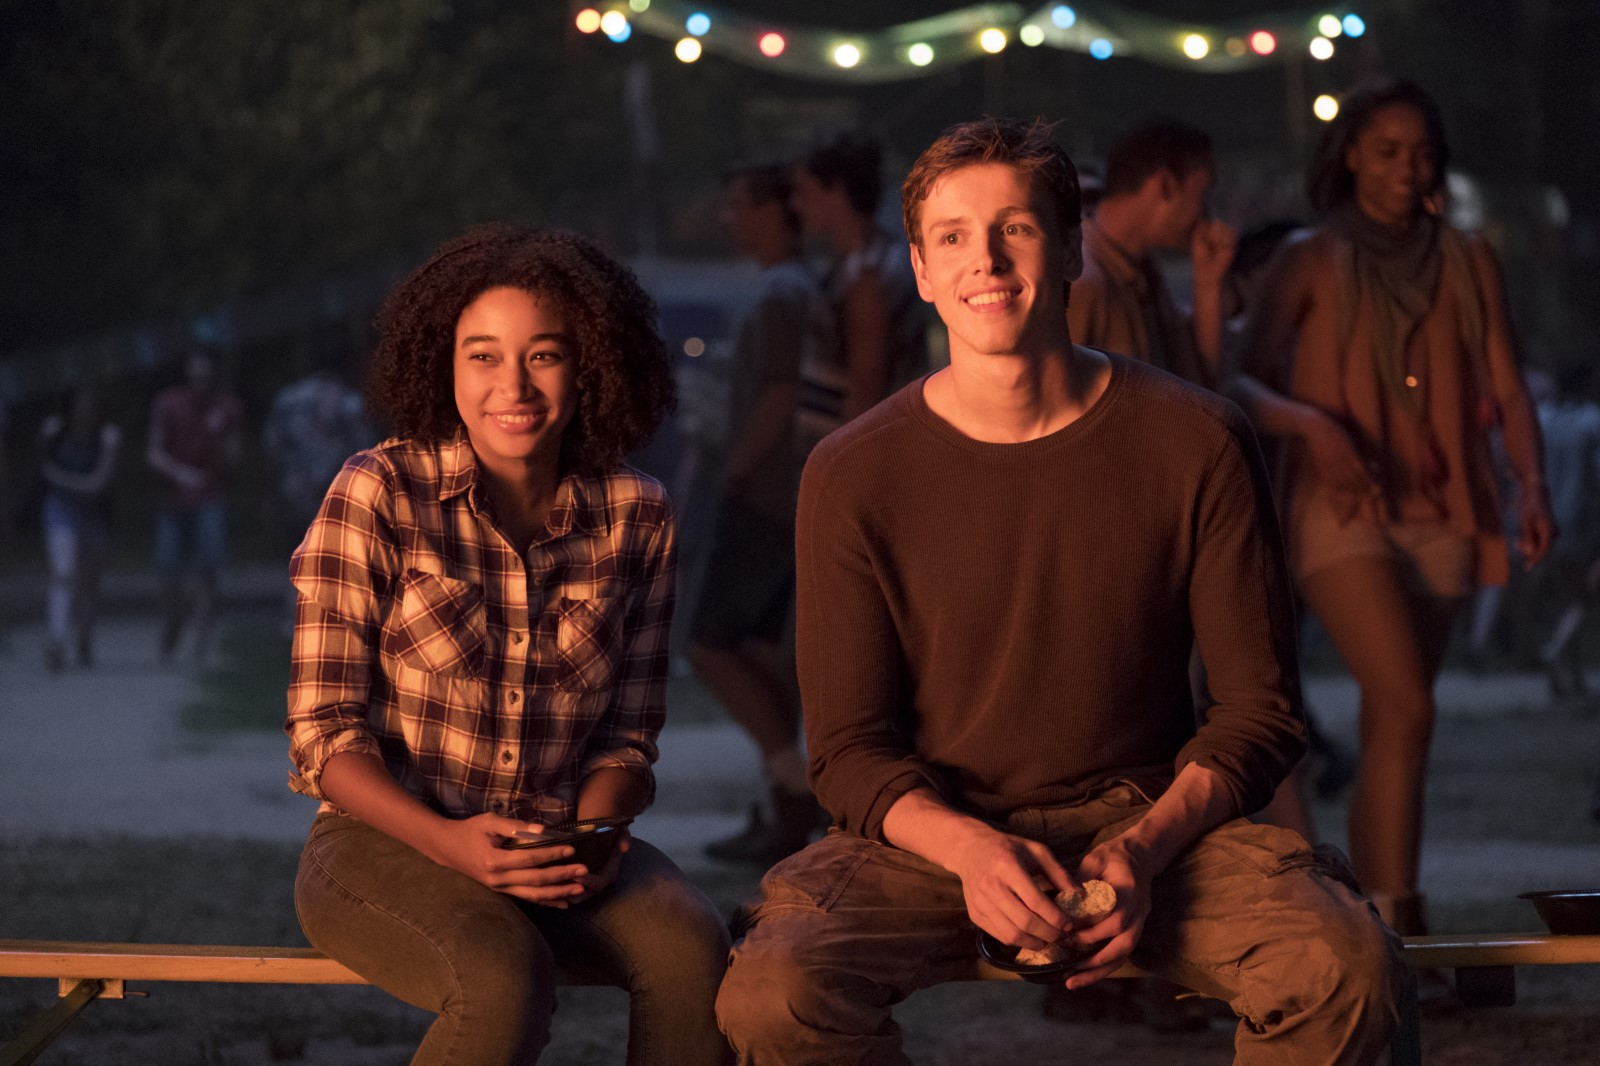 Darkest Minds : Un teen movie pas révolutionnaire